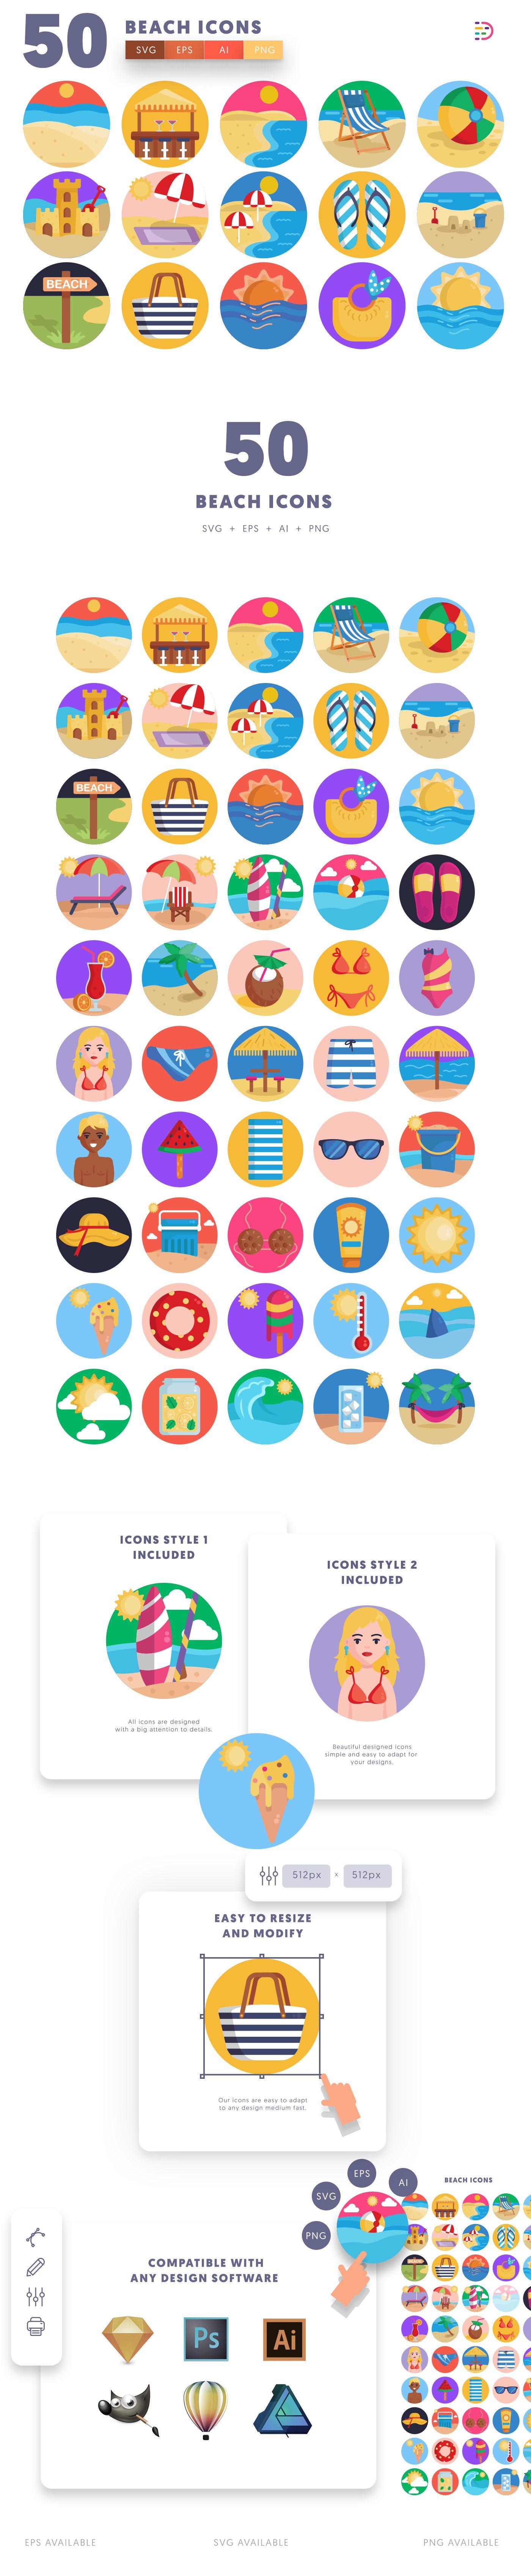 Beach icons info graphic